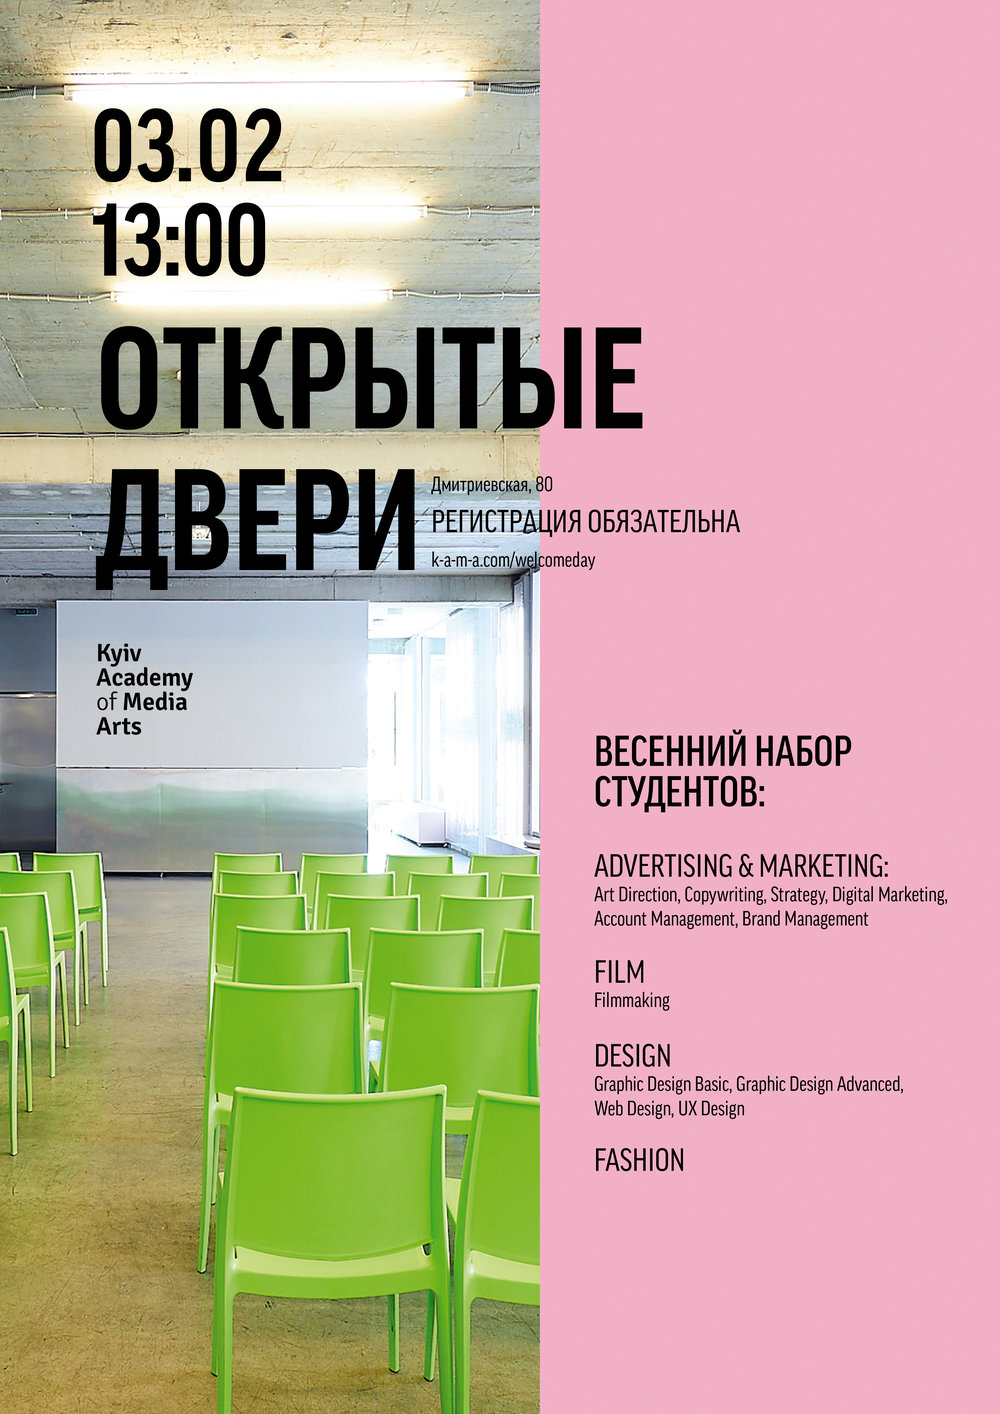 openday_print 2019.jpg